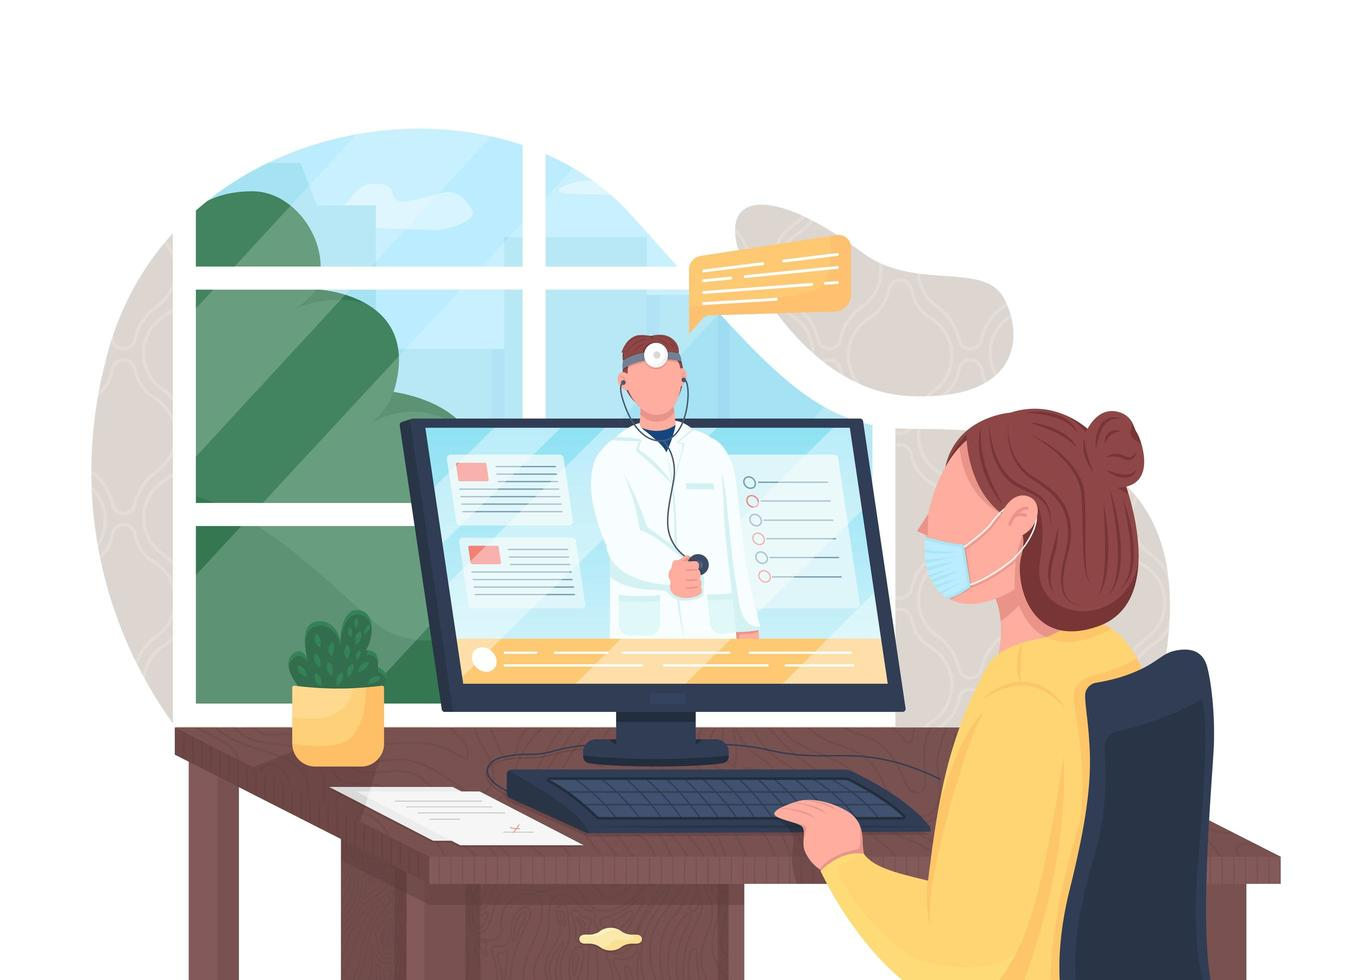 consulta médica online vetor